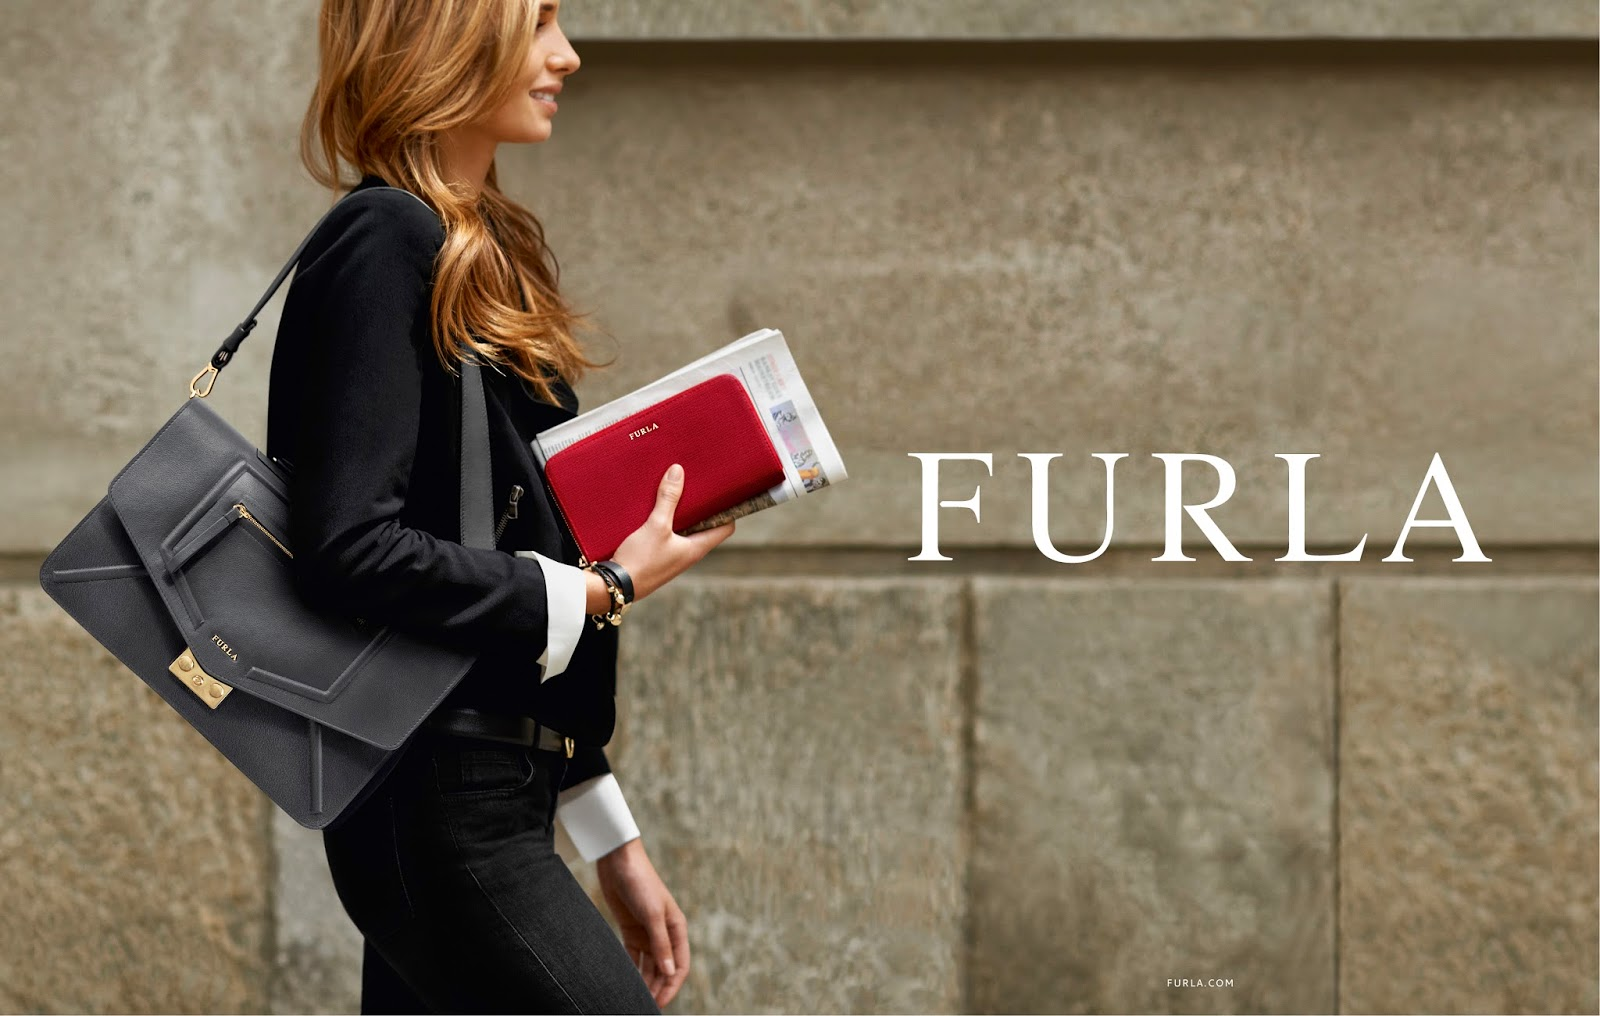 Furla Autumn/Winter 2014 Press Day